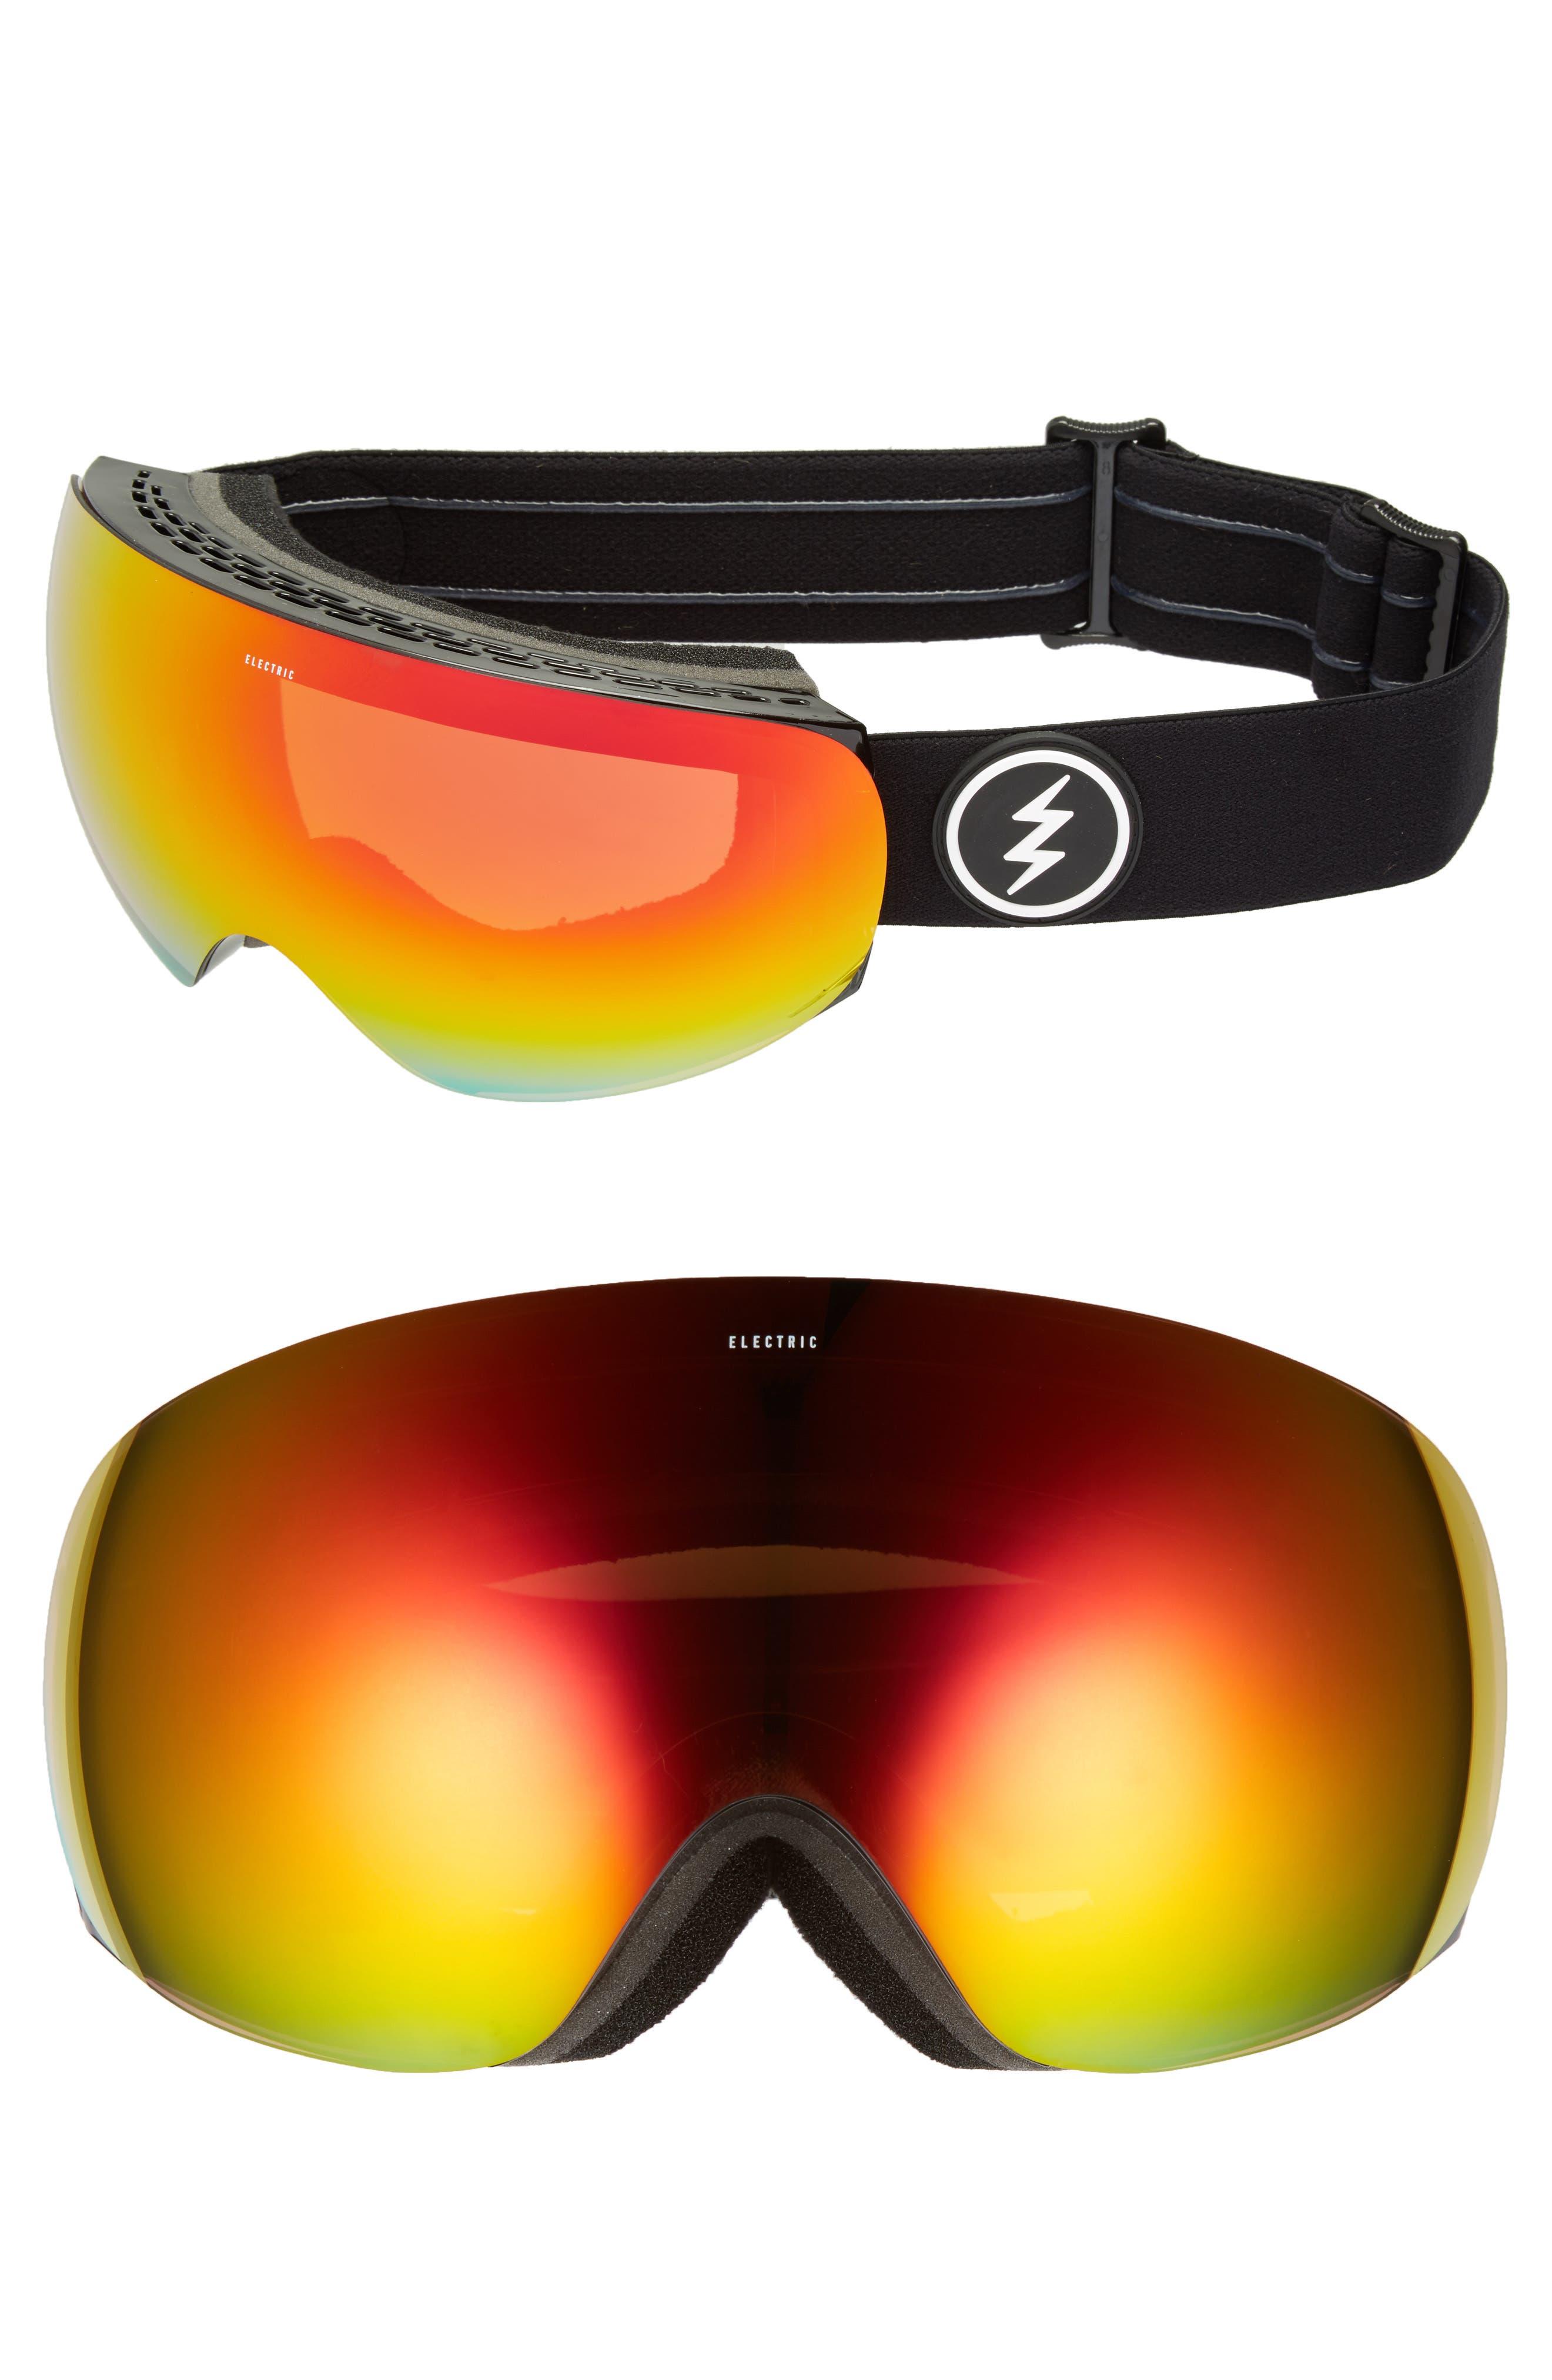 EG3.5 Snow Goggles,                         Main,                         color, Gloss Black/ Red Chrome